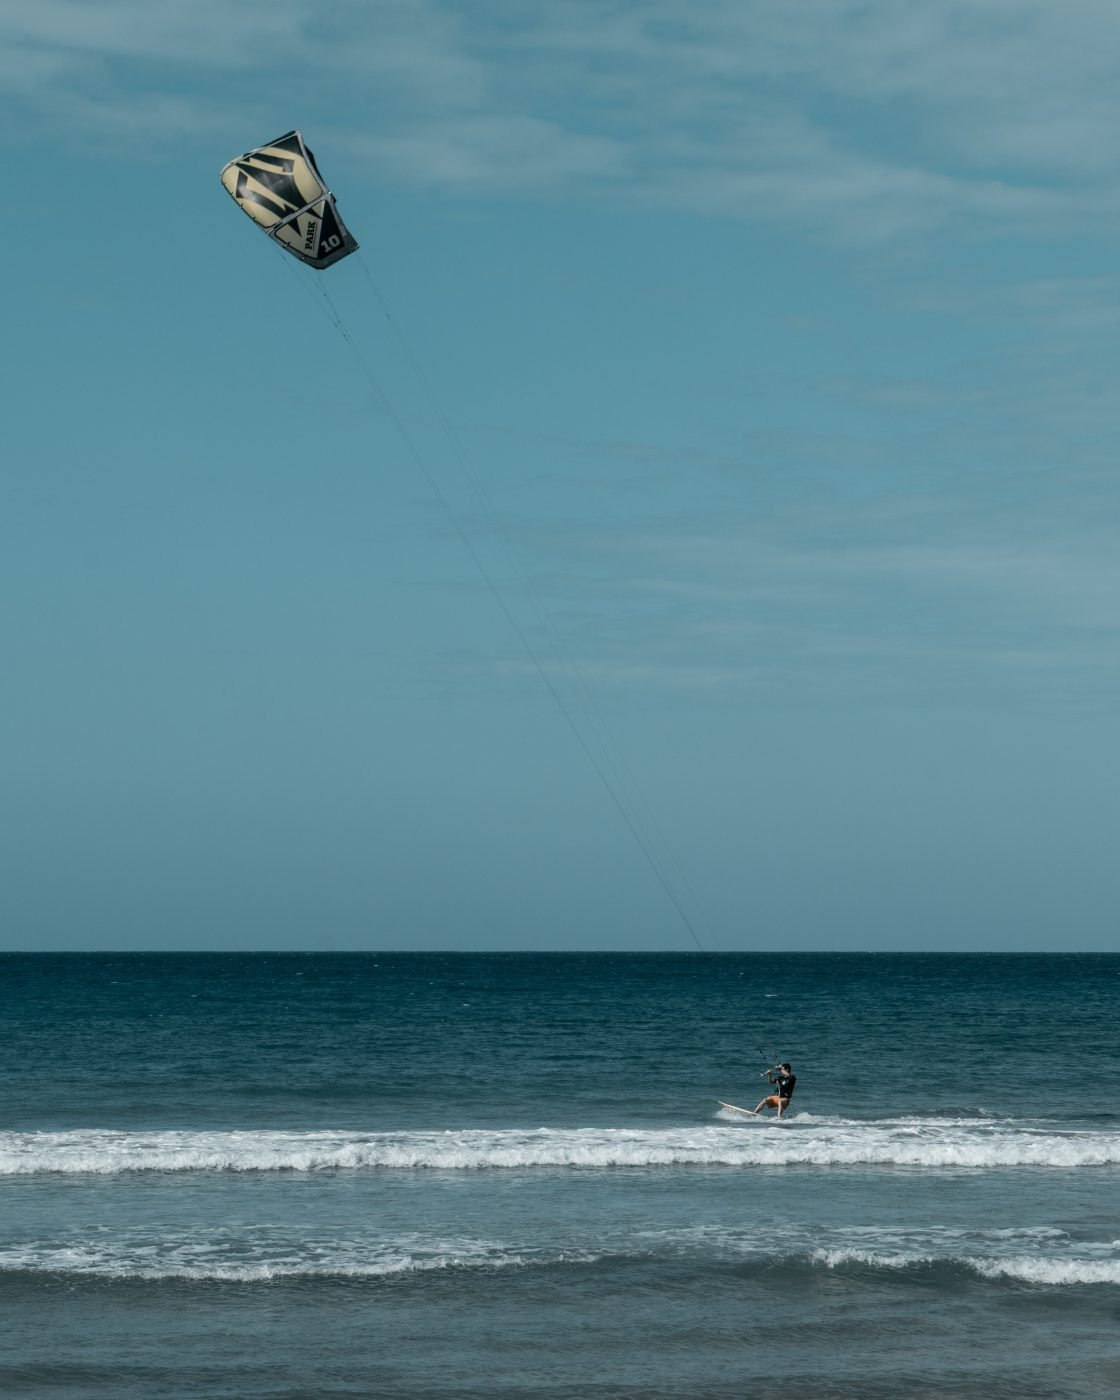 Kite Beach, Cabarete, Dominican Republic, kitesurfer